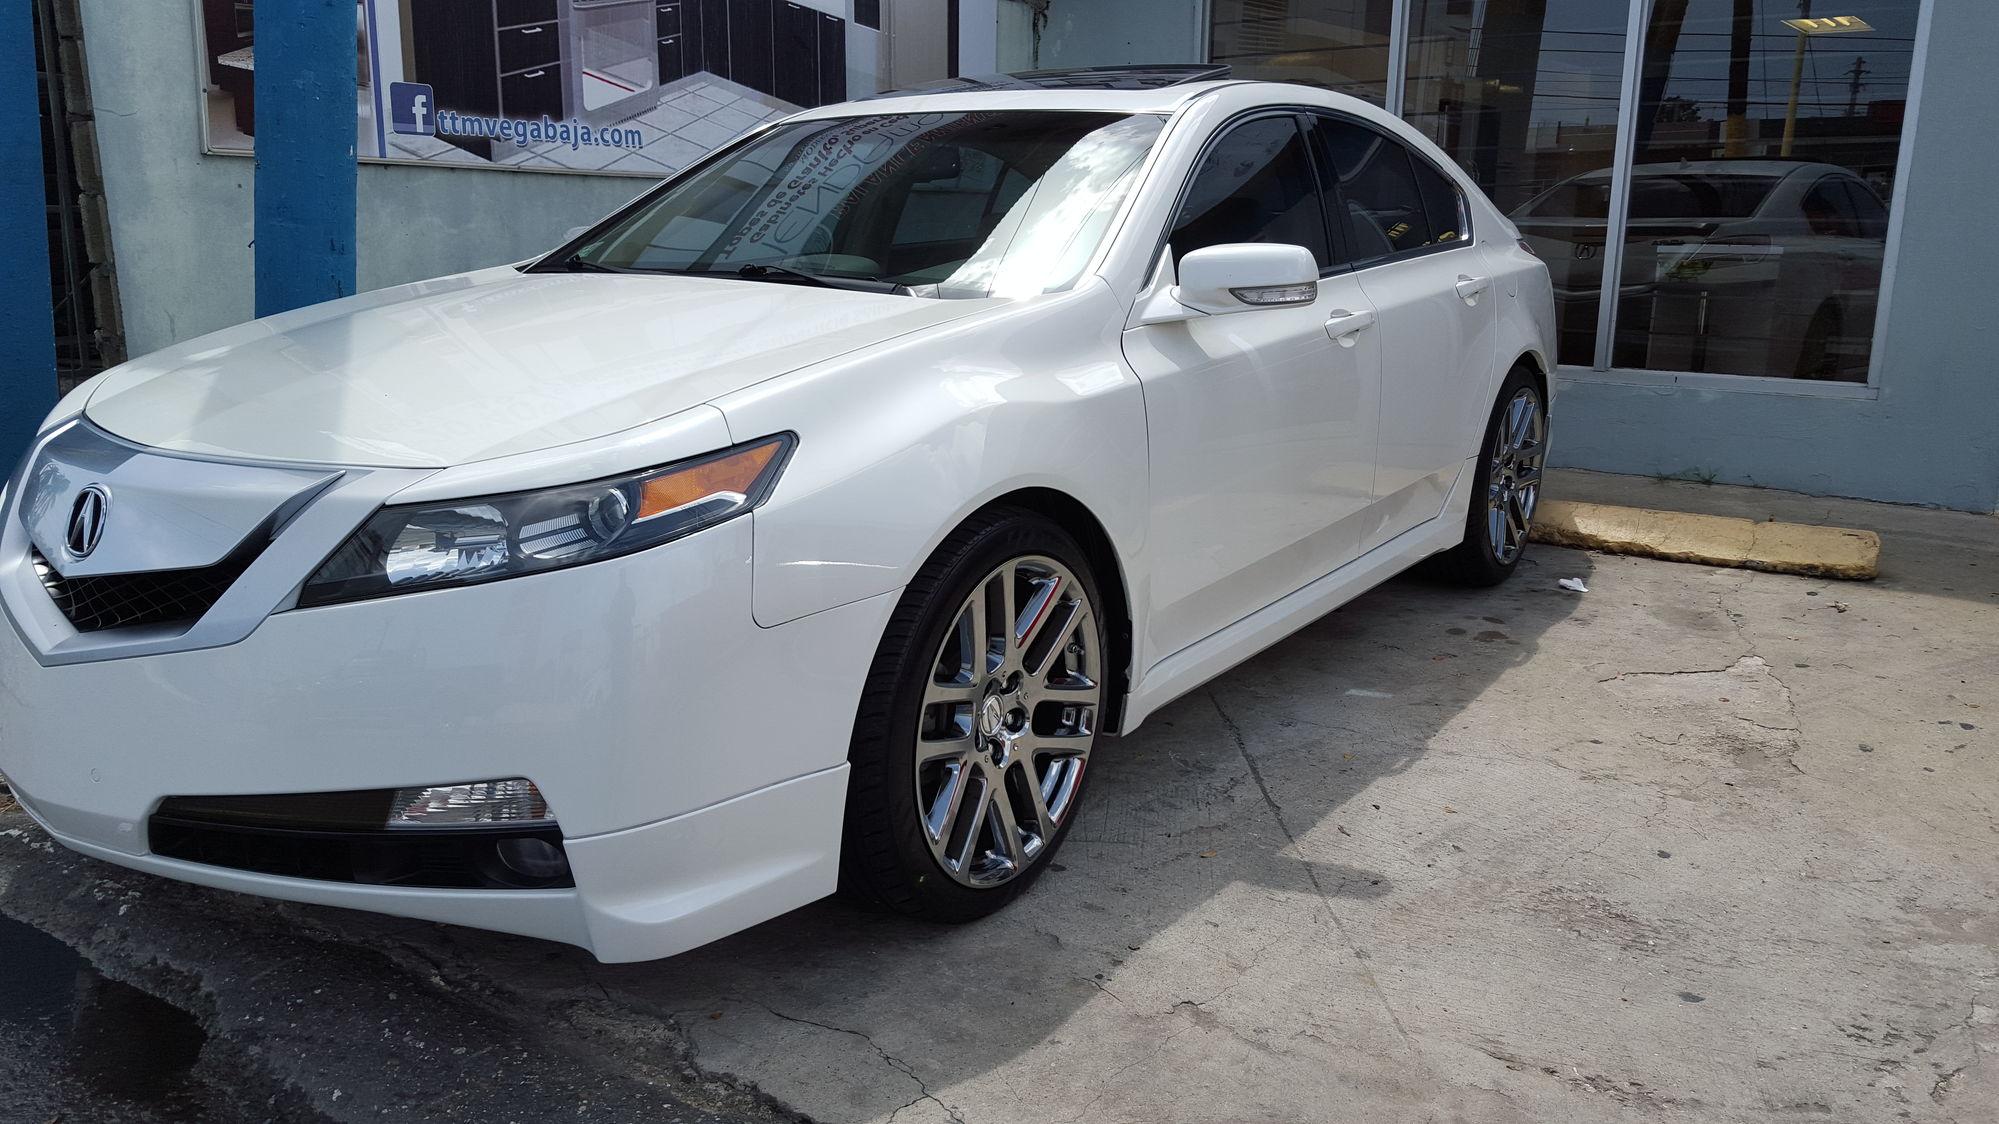 Acura Oem Wheels >> Acura TL ZDX Wheels & Body Kit OEM - AcuraZine - Acura Enthusiast Community